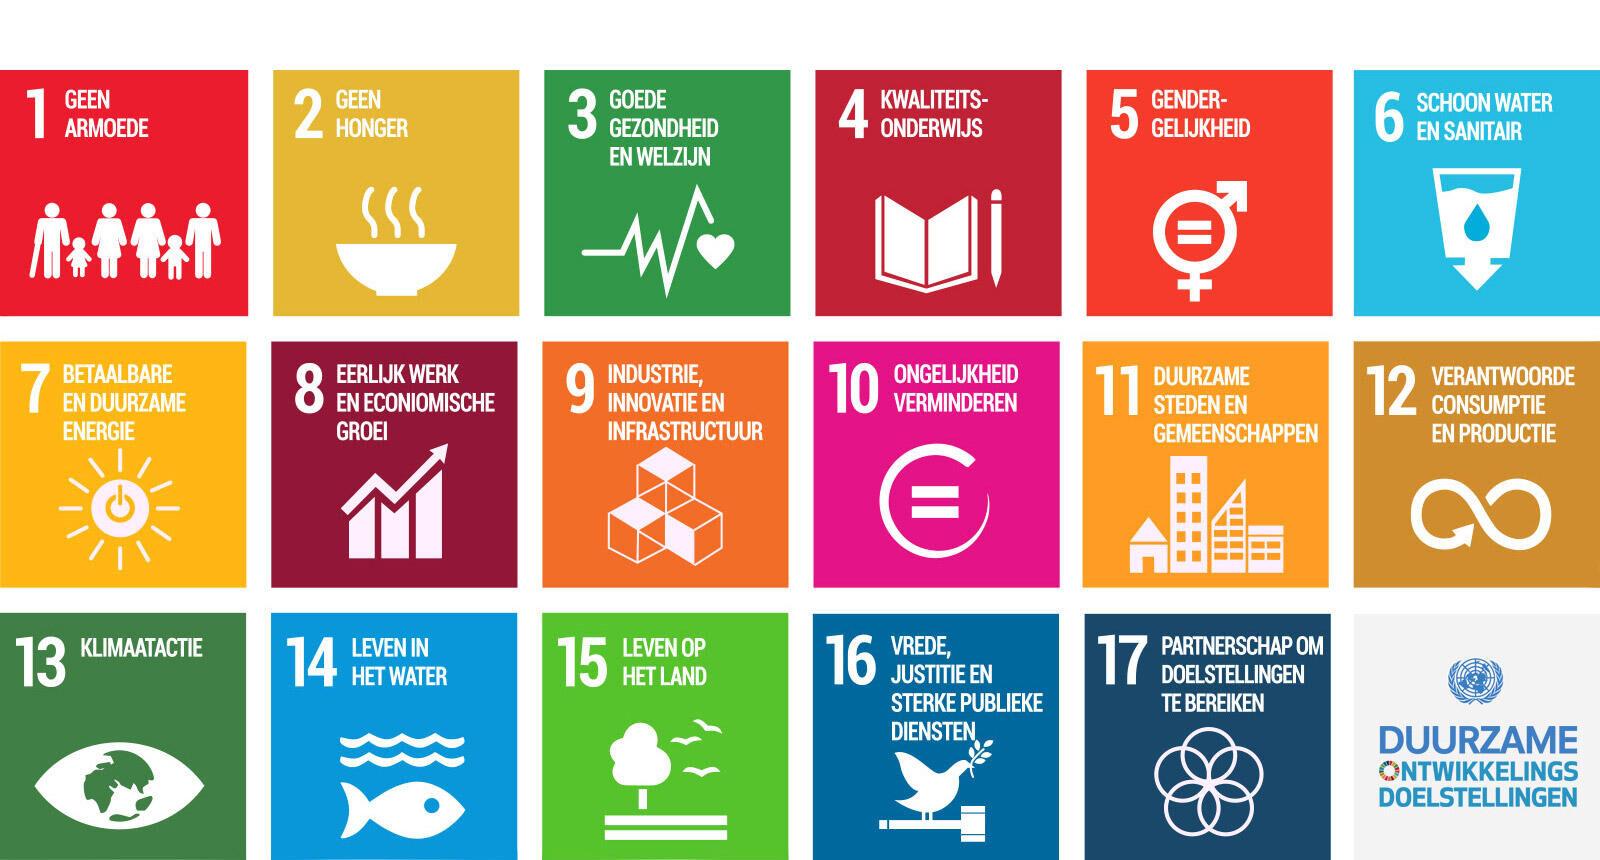 People, Planet, Prosperity, Peace & Partnerships